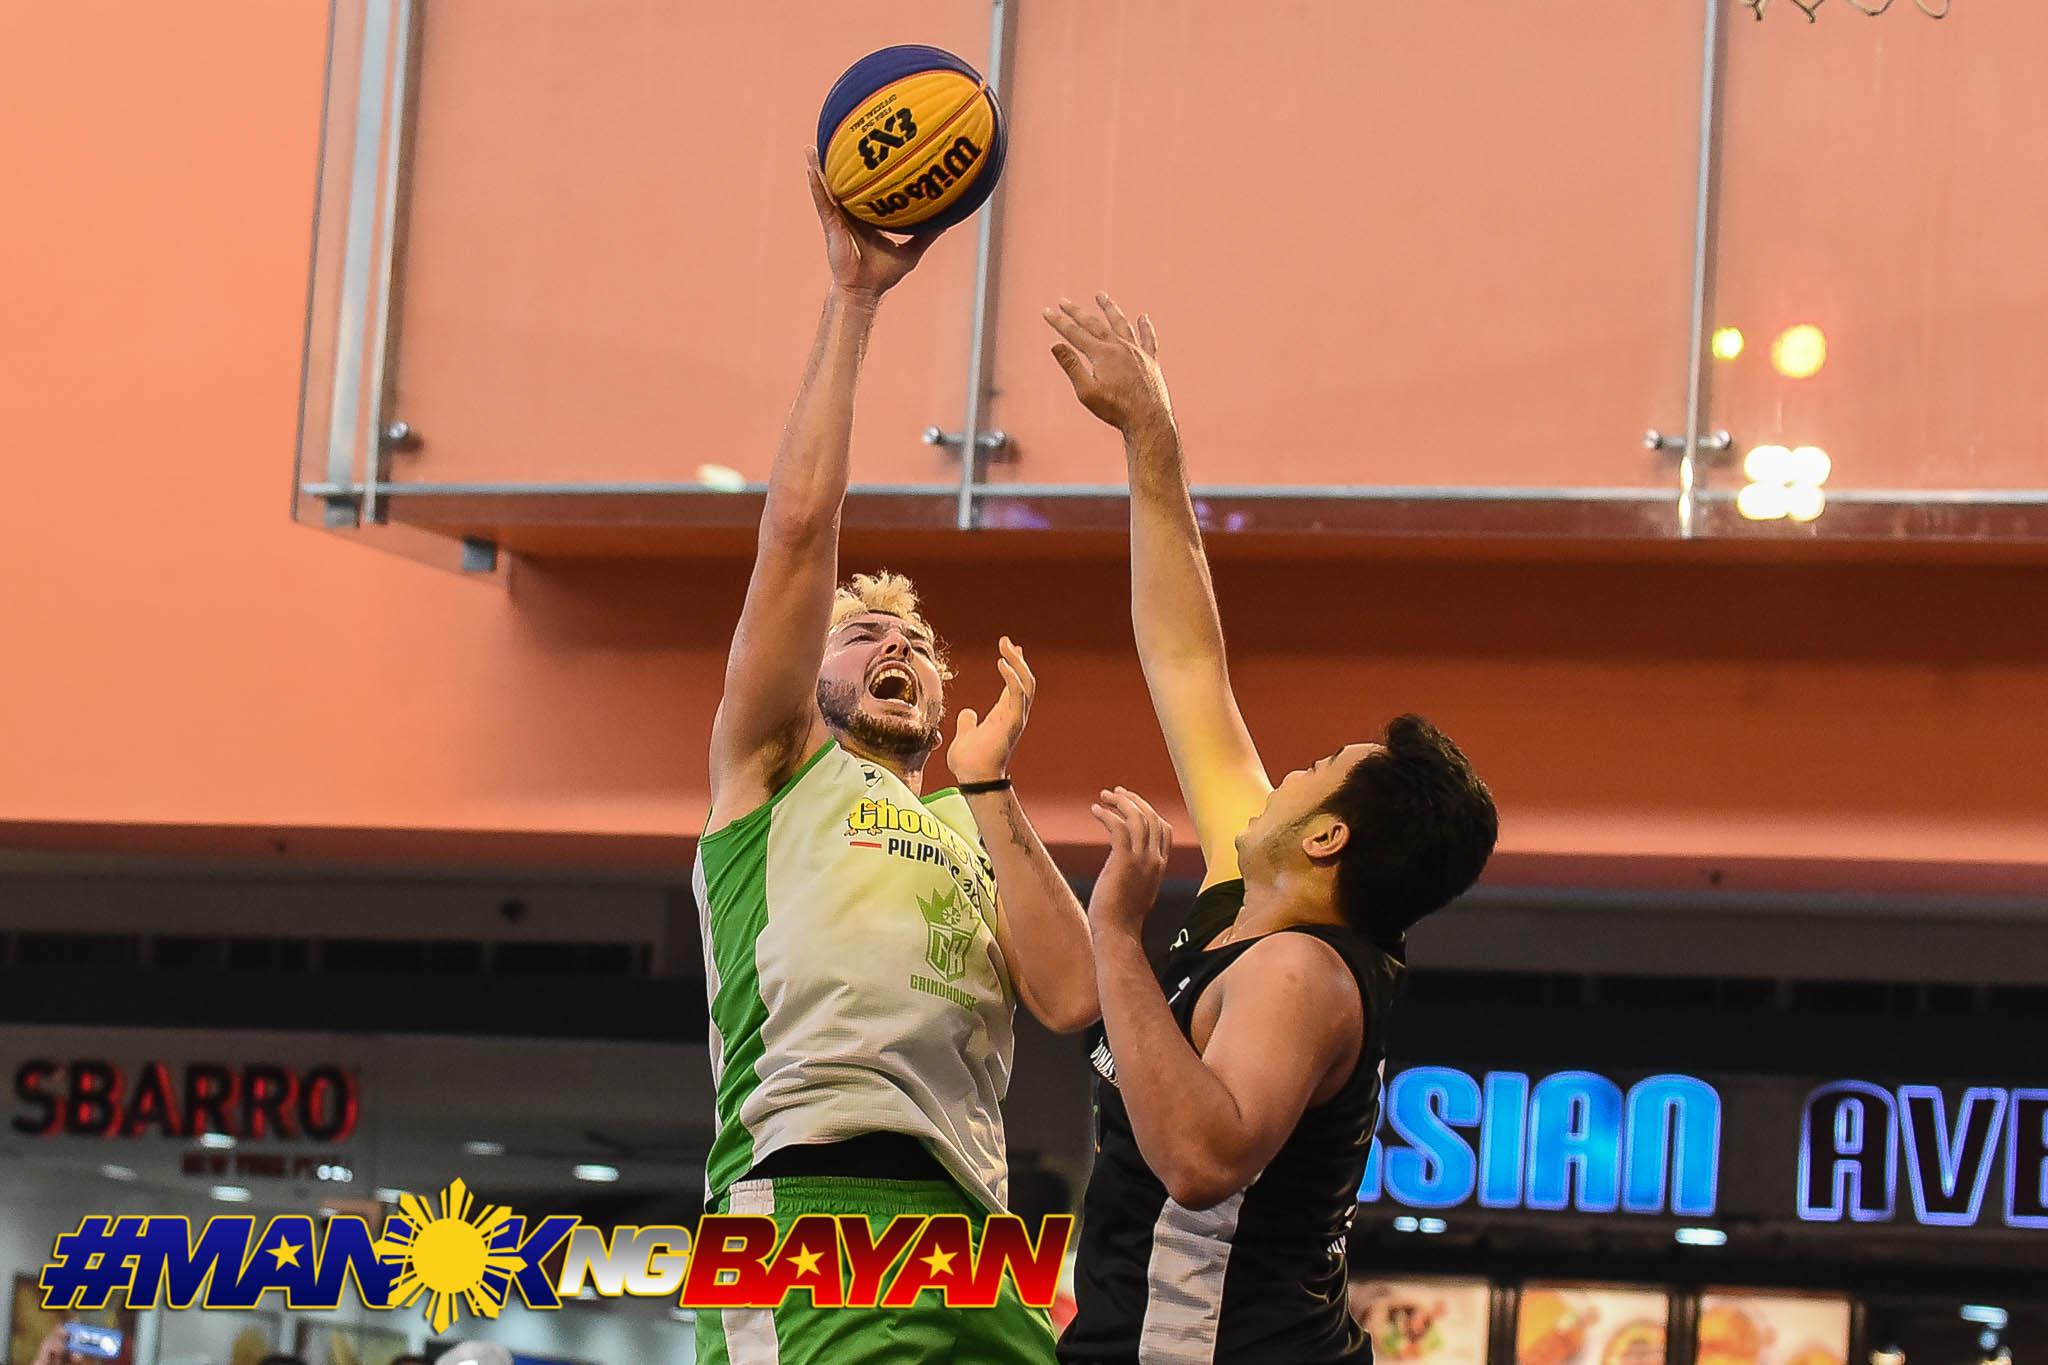 Chooks-3x3-Pasig-vs.-Bataan-Statham-2098 Taylor Statham hopes his PBA Draft requirements meet deadline Basketball News PBA  - philippine sports news